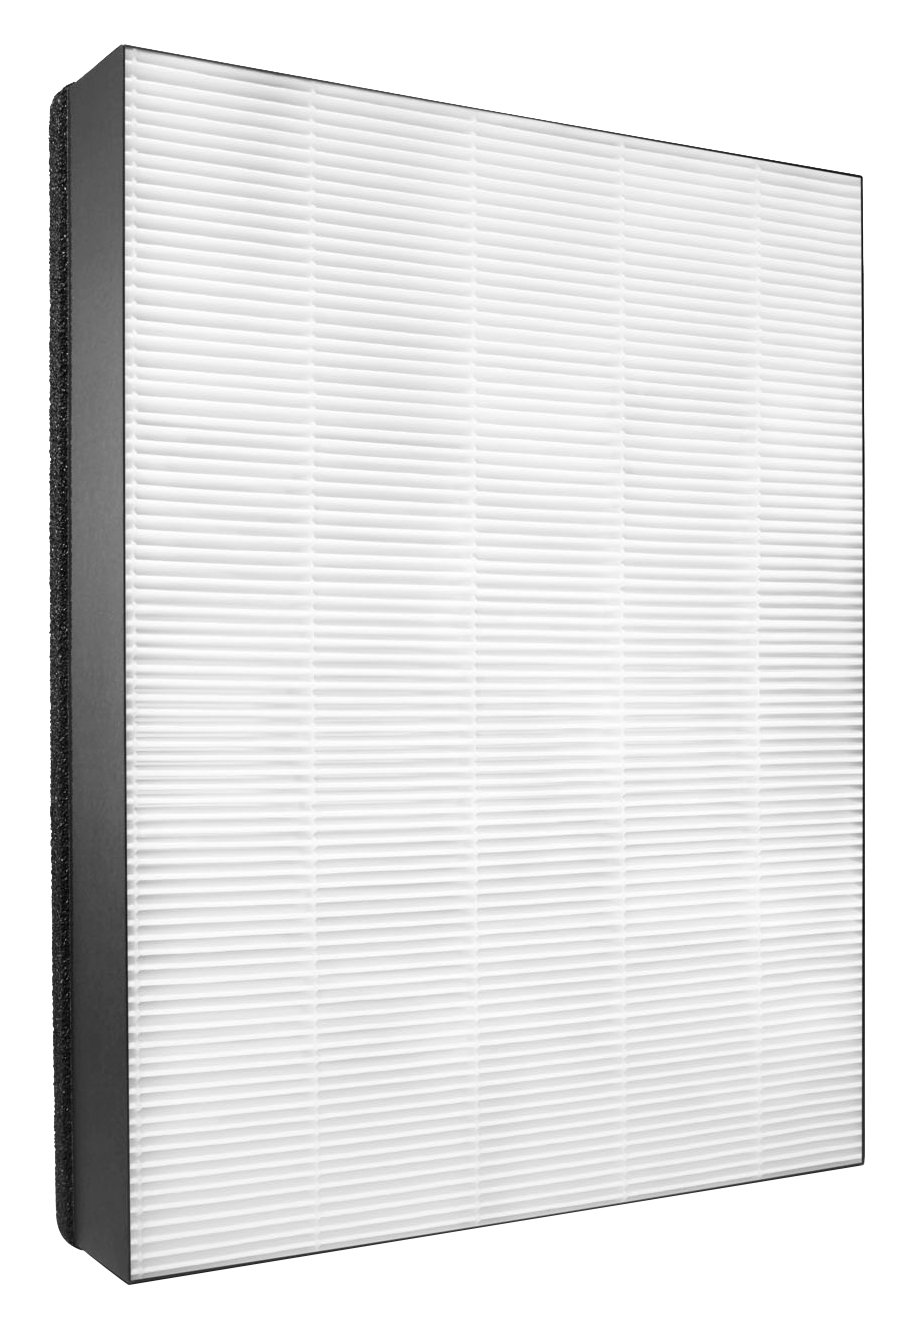 Philips Qualit/à Aria FY2420//30 Filtro Nanoprotect a Carboni Attivi